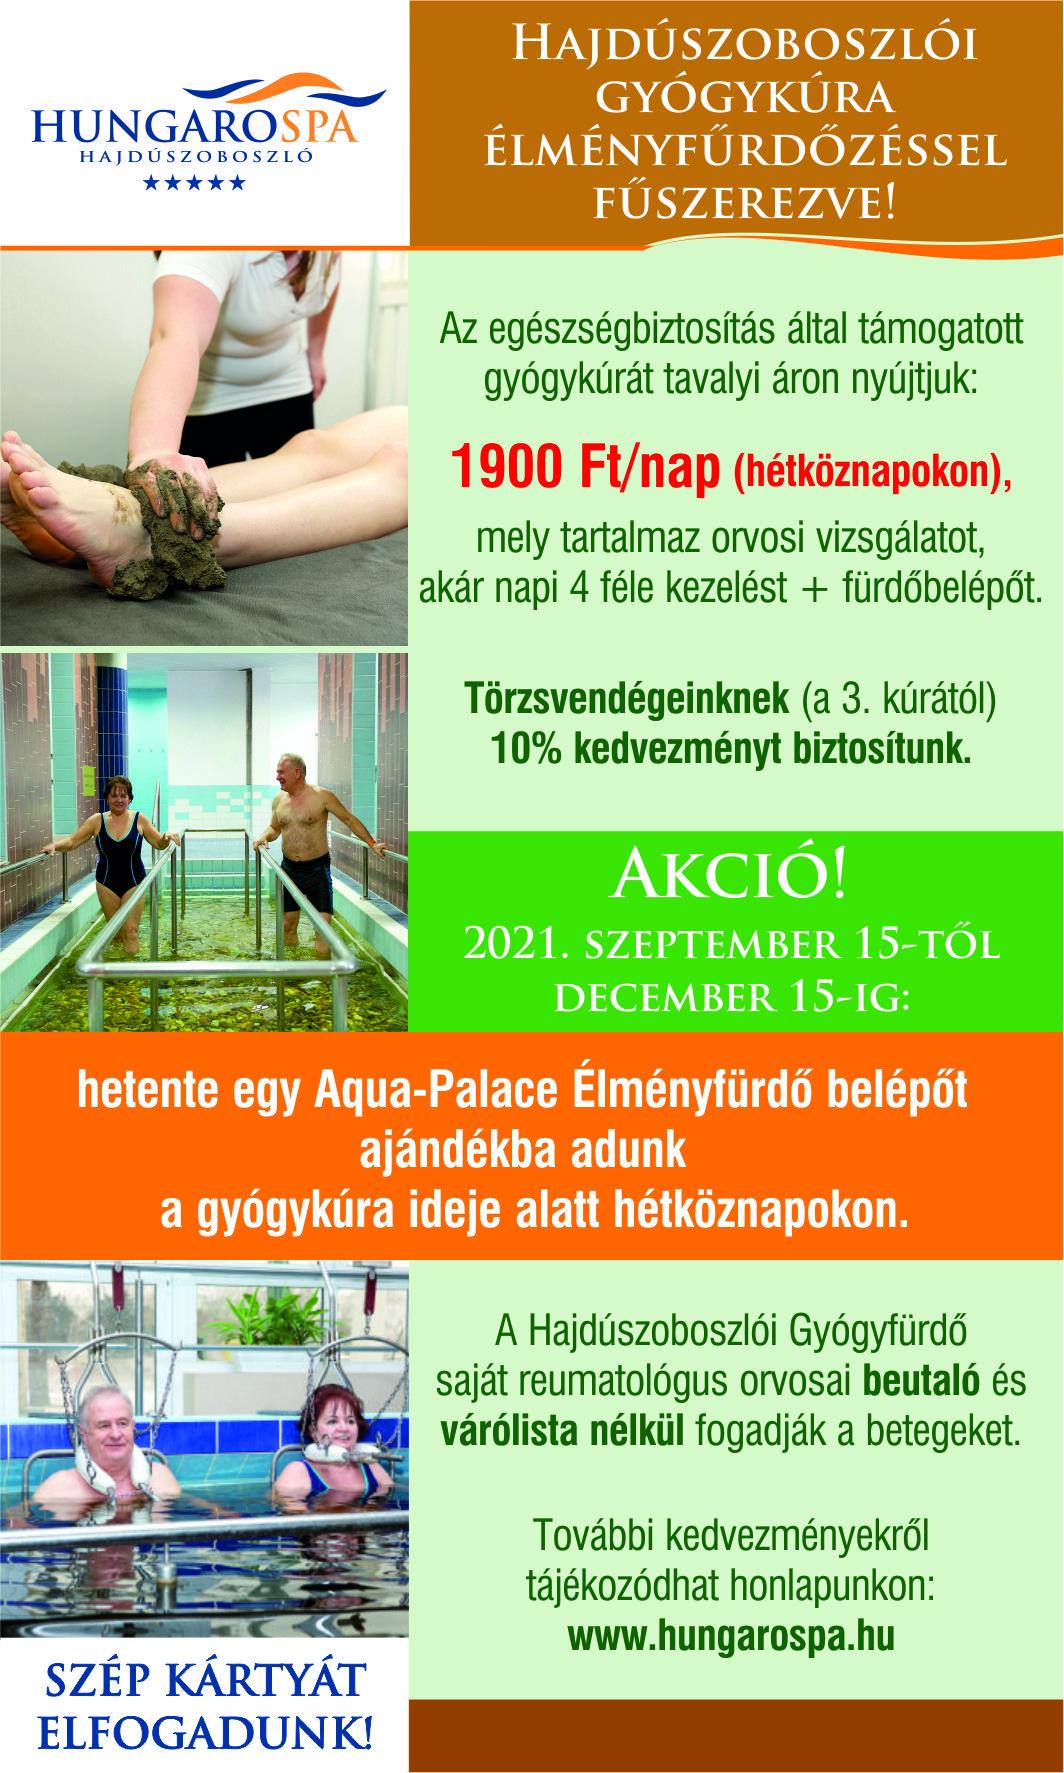 gyogy_varosi_90x150CMYK